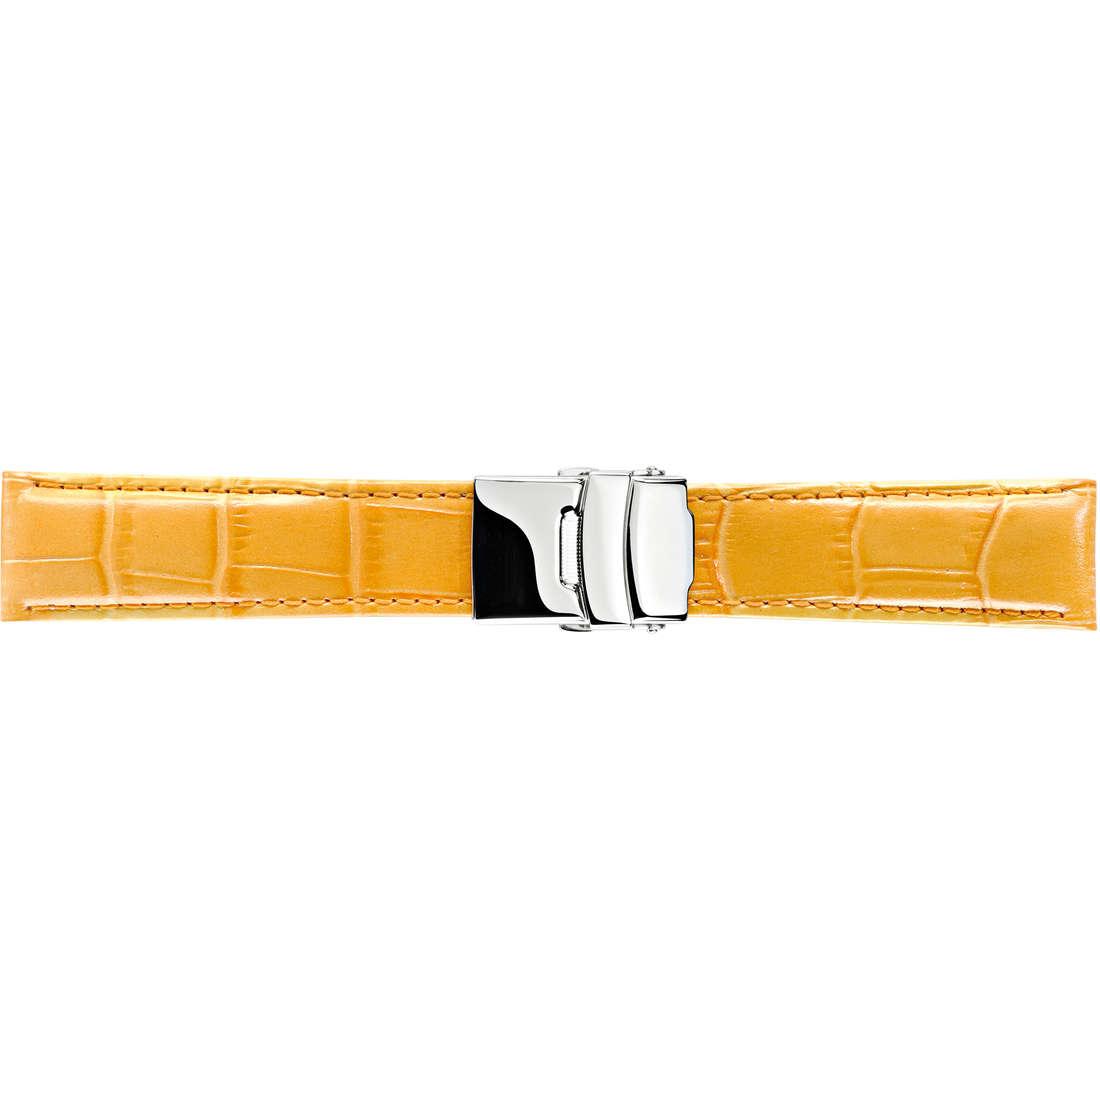 watch watch bands watch straps man Morellato Morellato 1930 A01U3084656286CR22